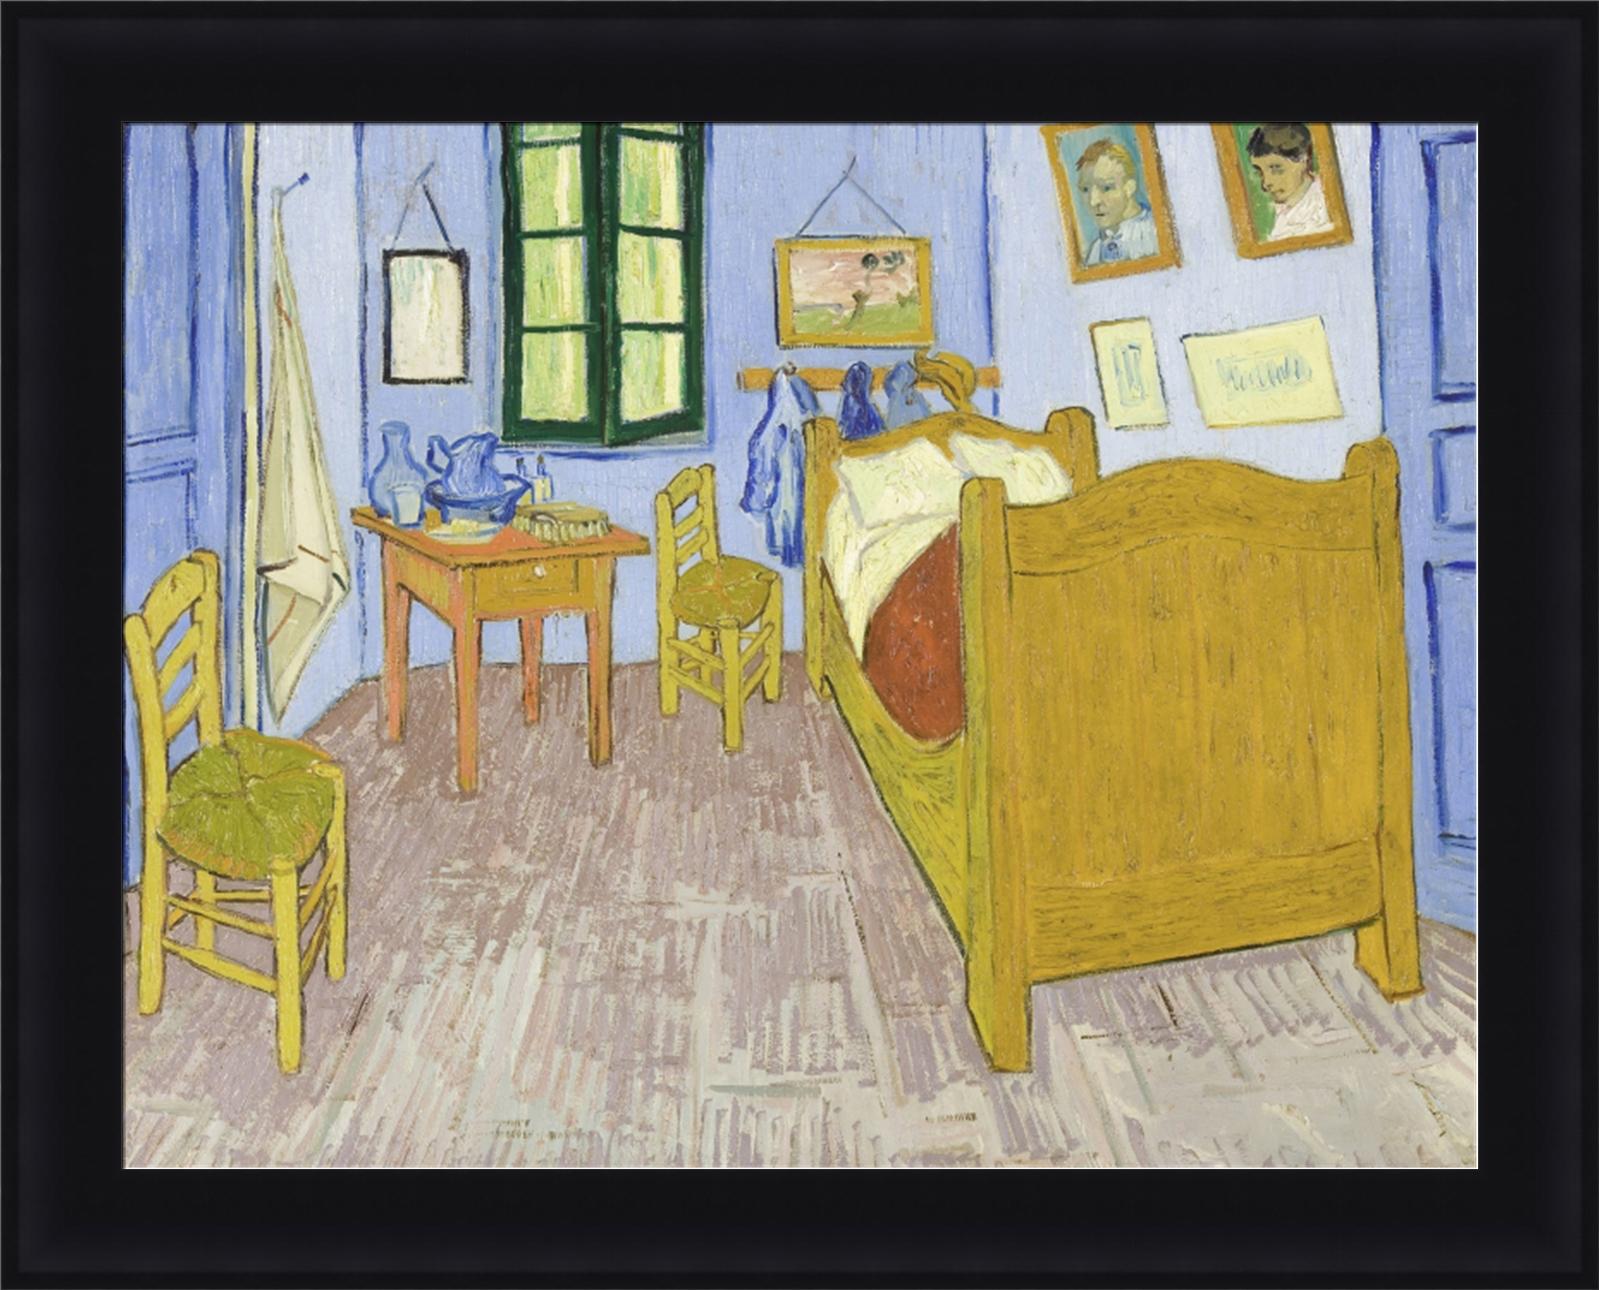 vincent van gogh bedroom in arles framed canvas giclee print 33 5 034